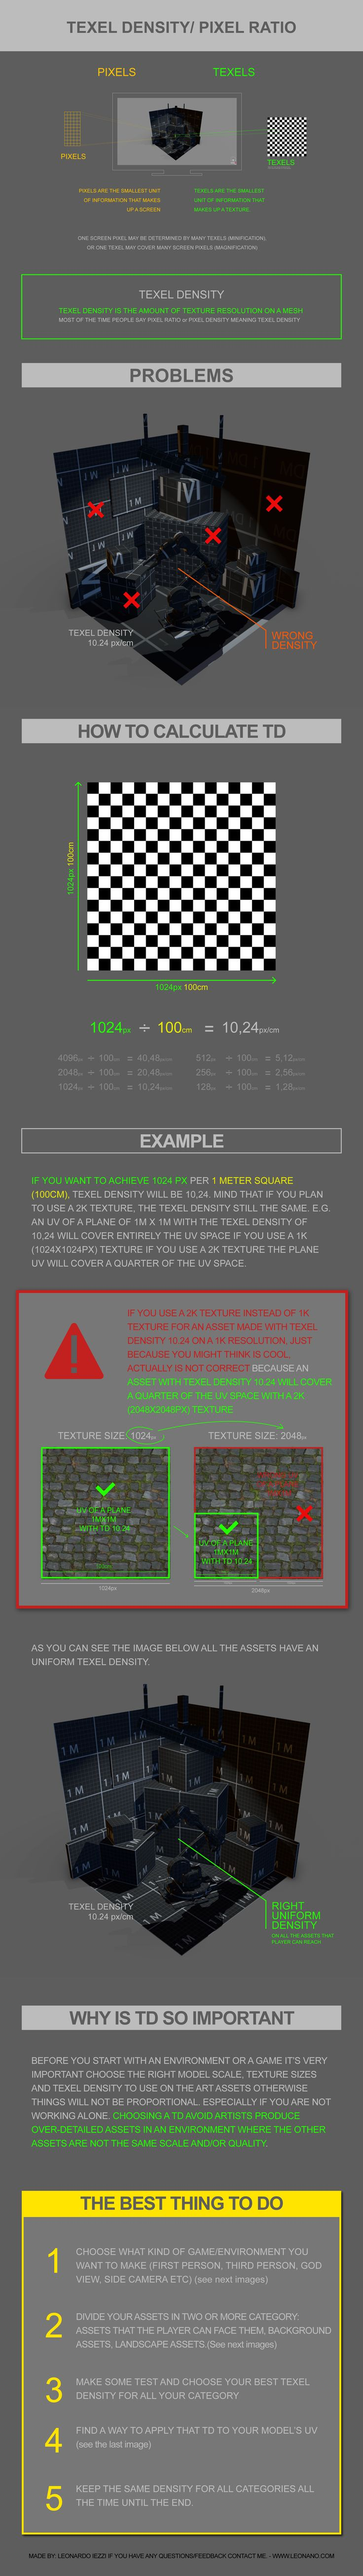 Leonardo Iezzi Texeld Density All You Need To Know Tutorial